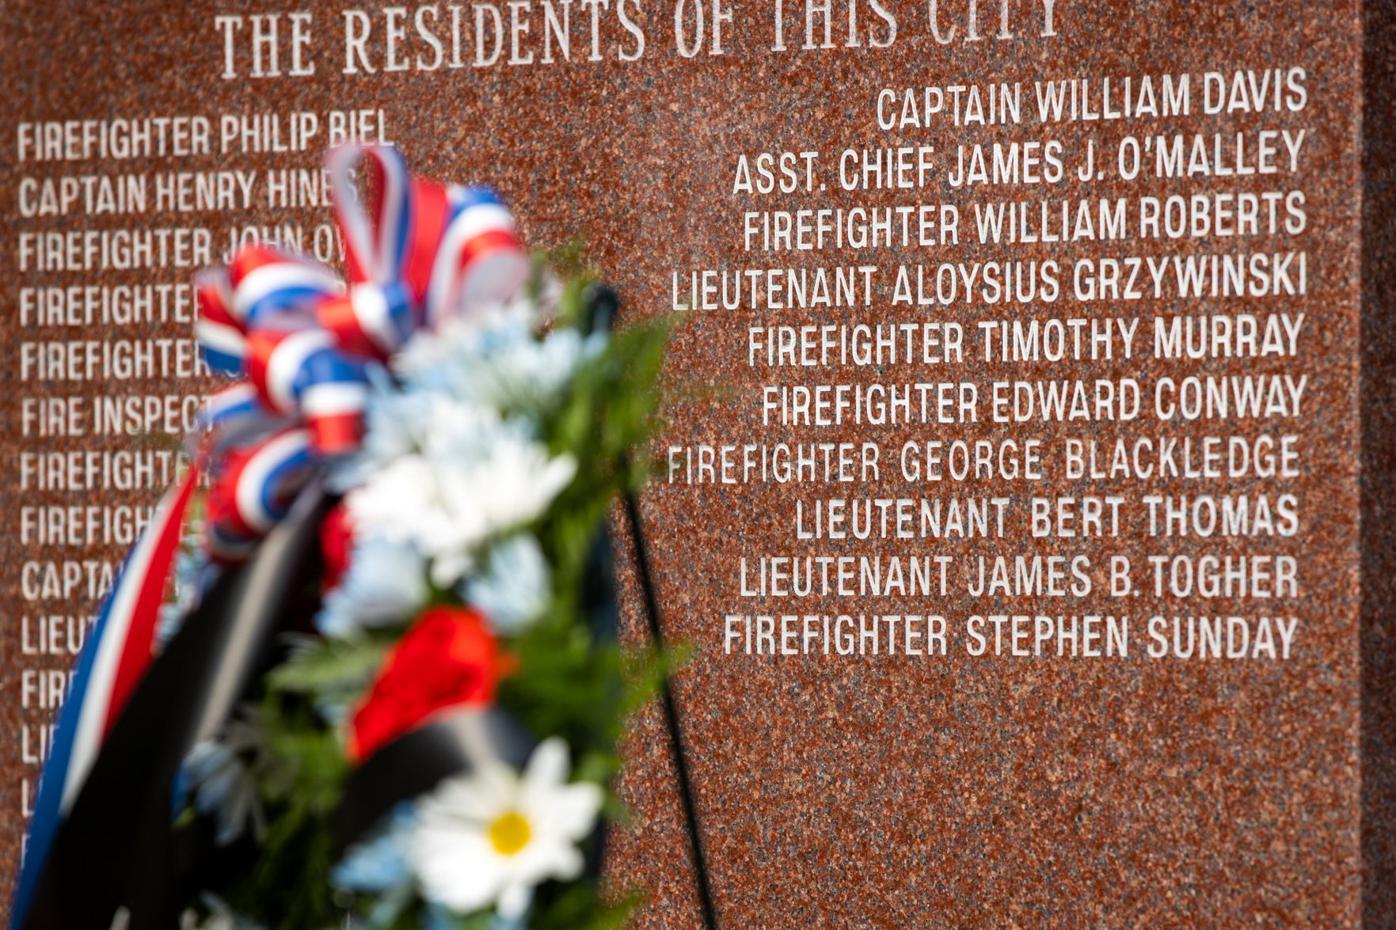 Firefighters added to Scranton memorial